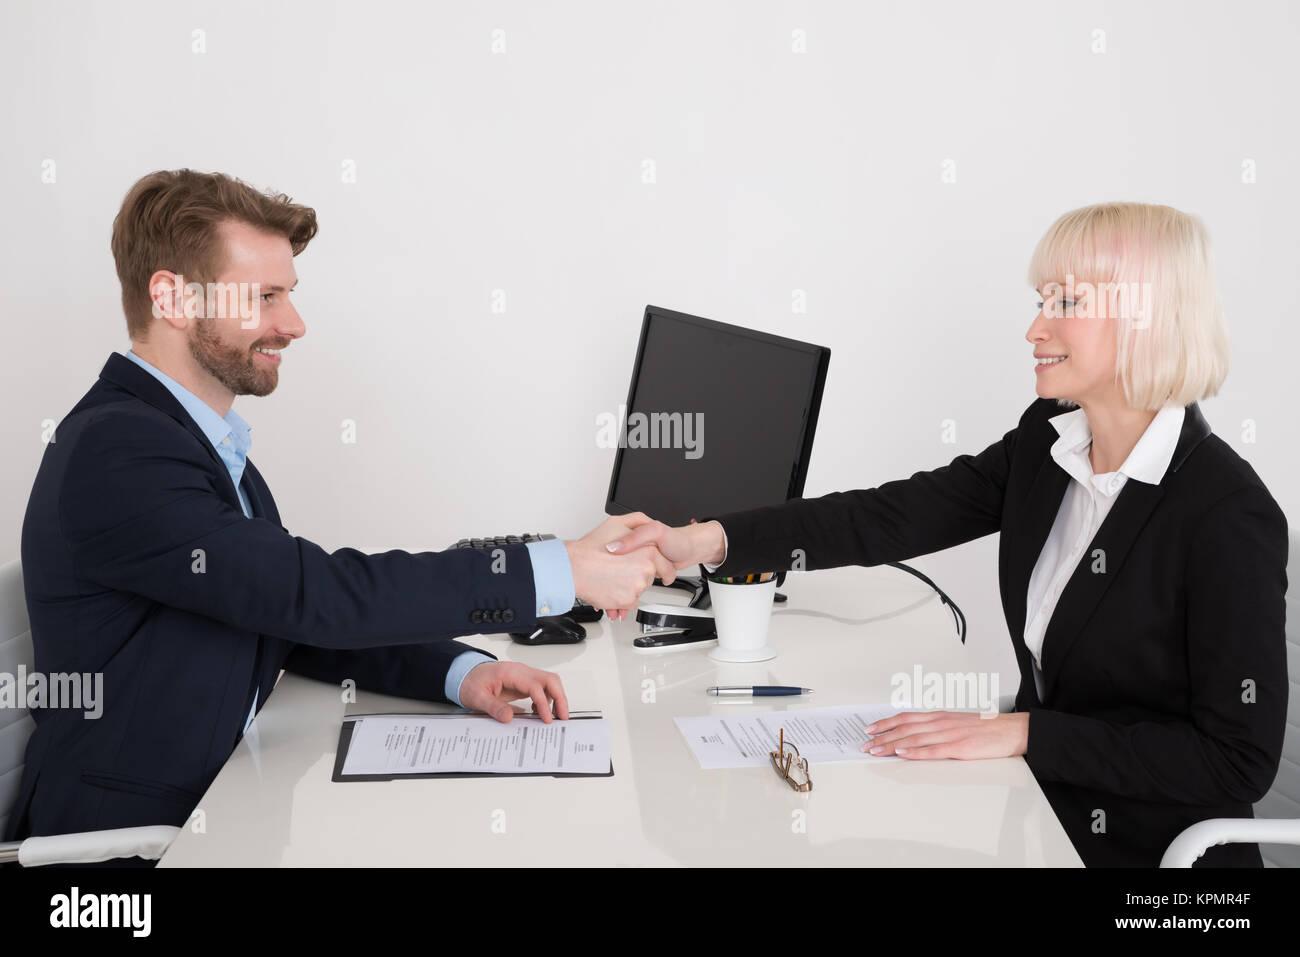 Businesspeople Shaking Hand - Stock Image